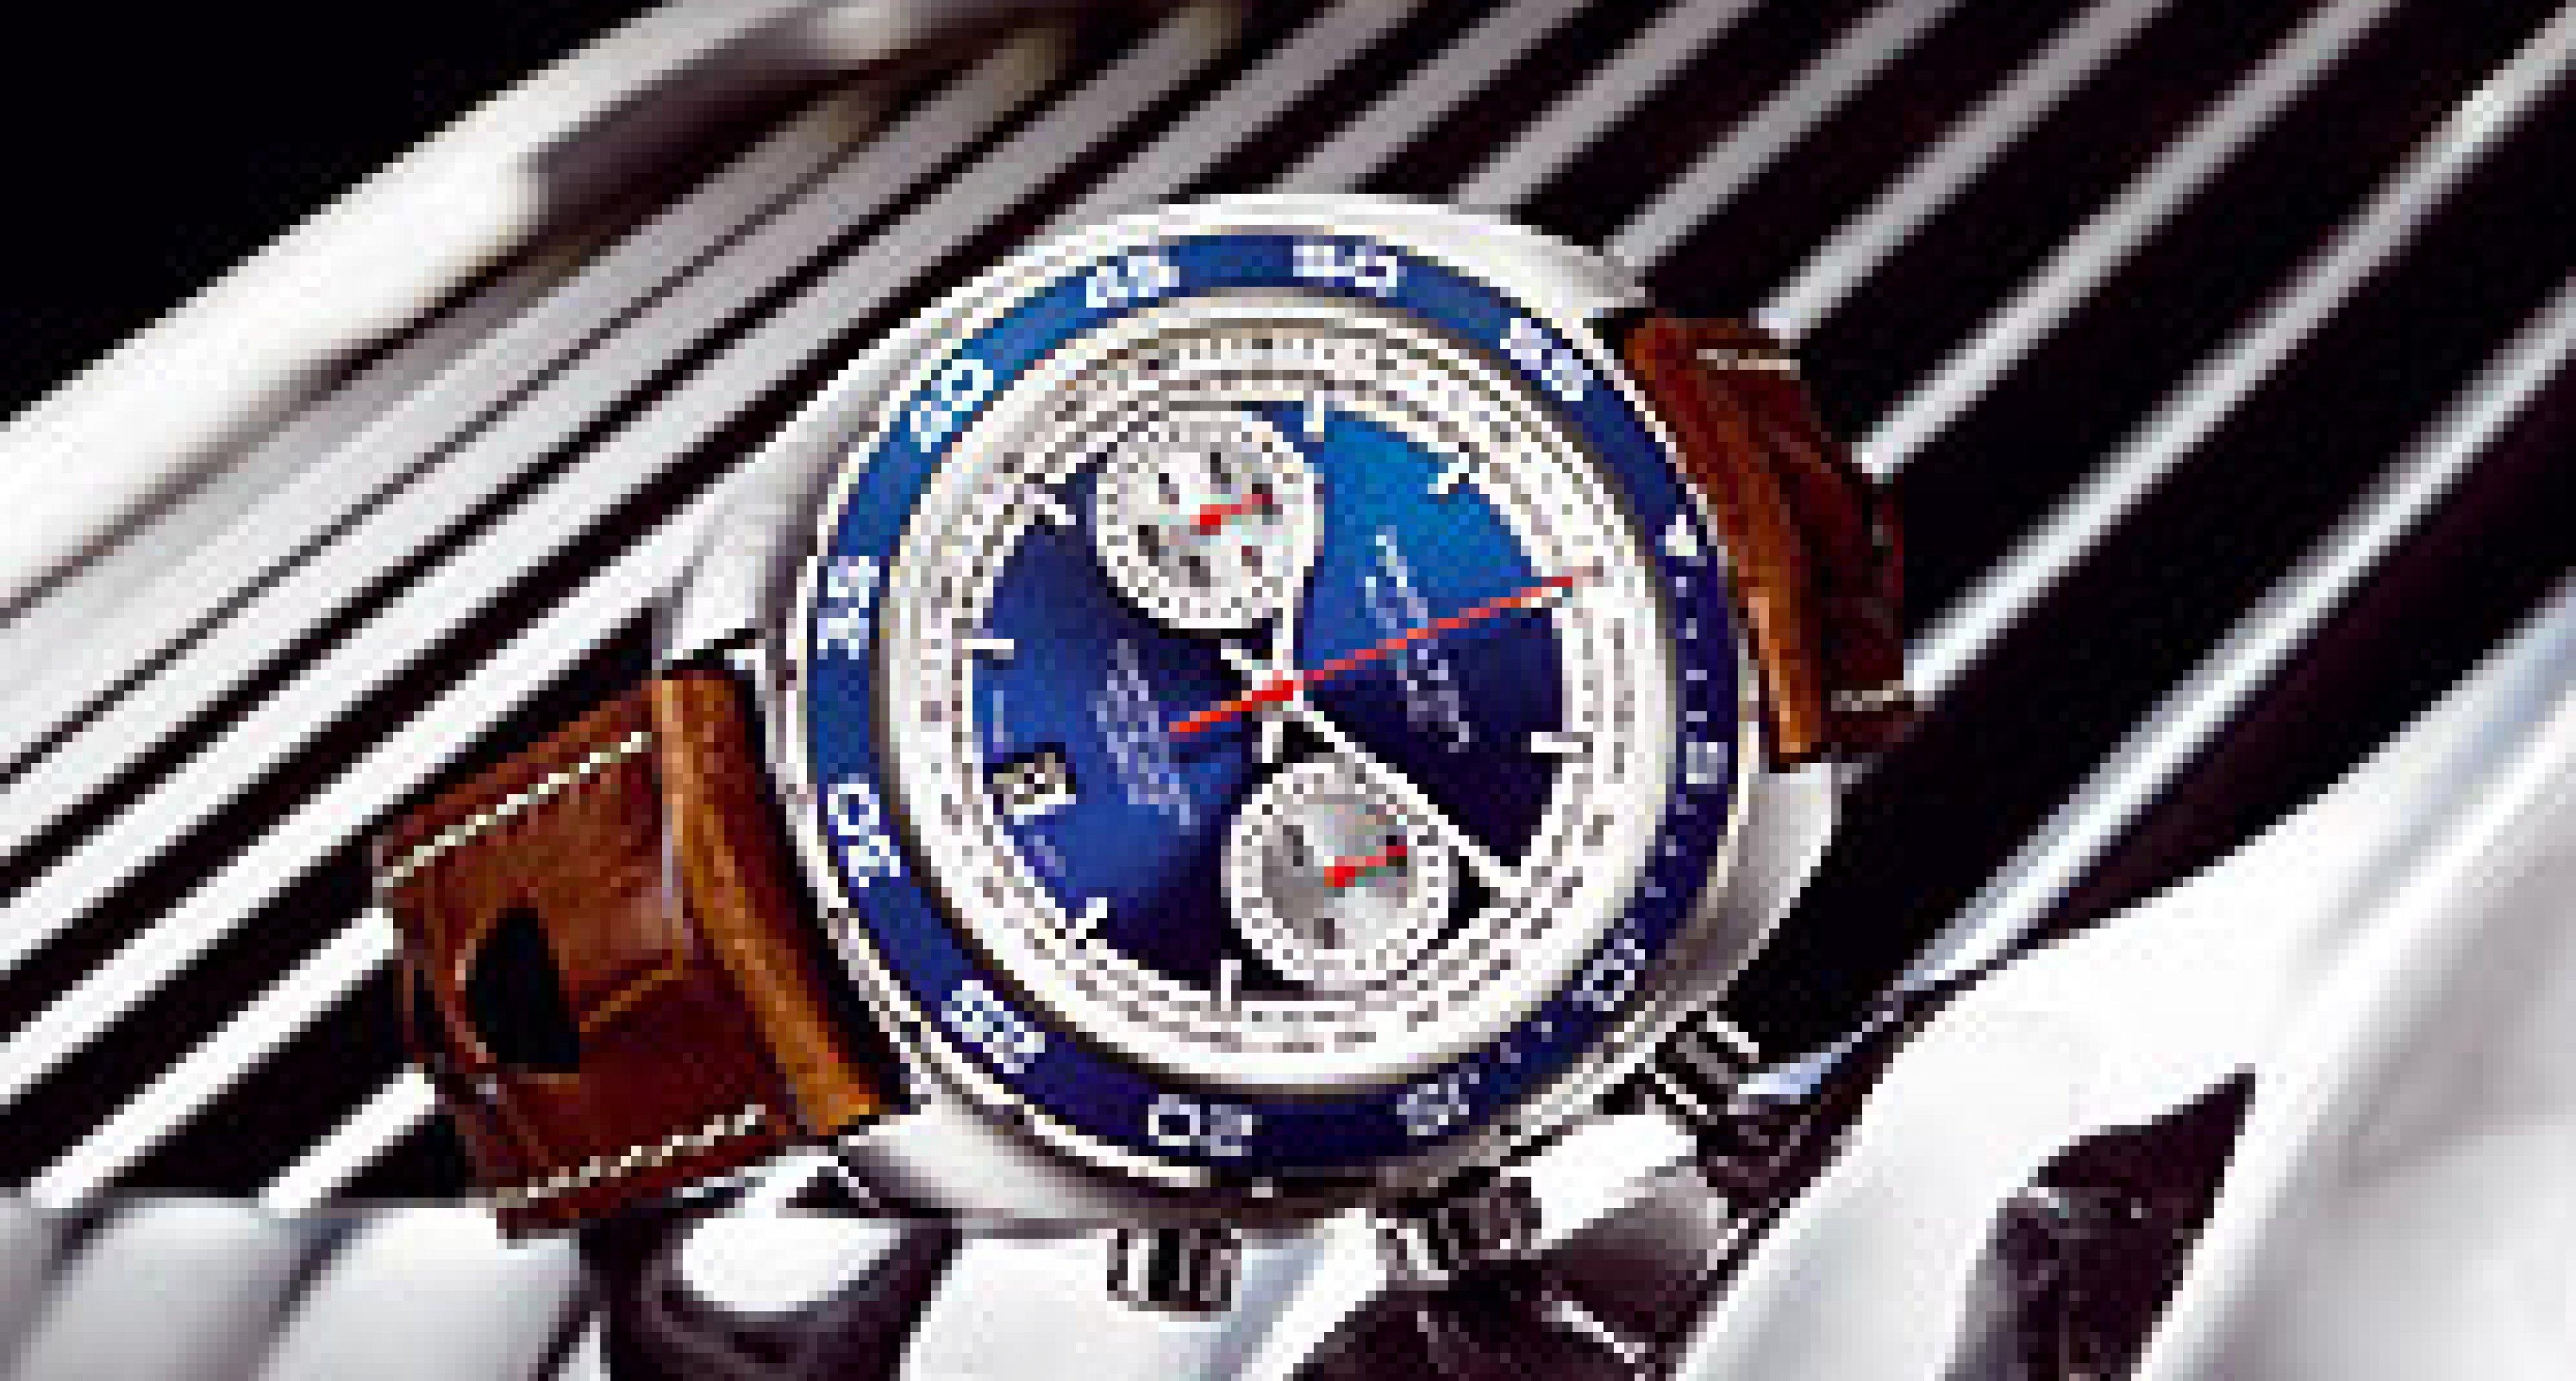 Baselworld 2011: Simon de Burton's Pick of the World's Biggest Watch Fair